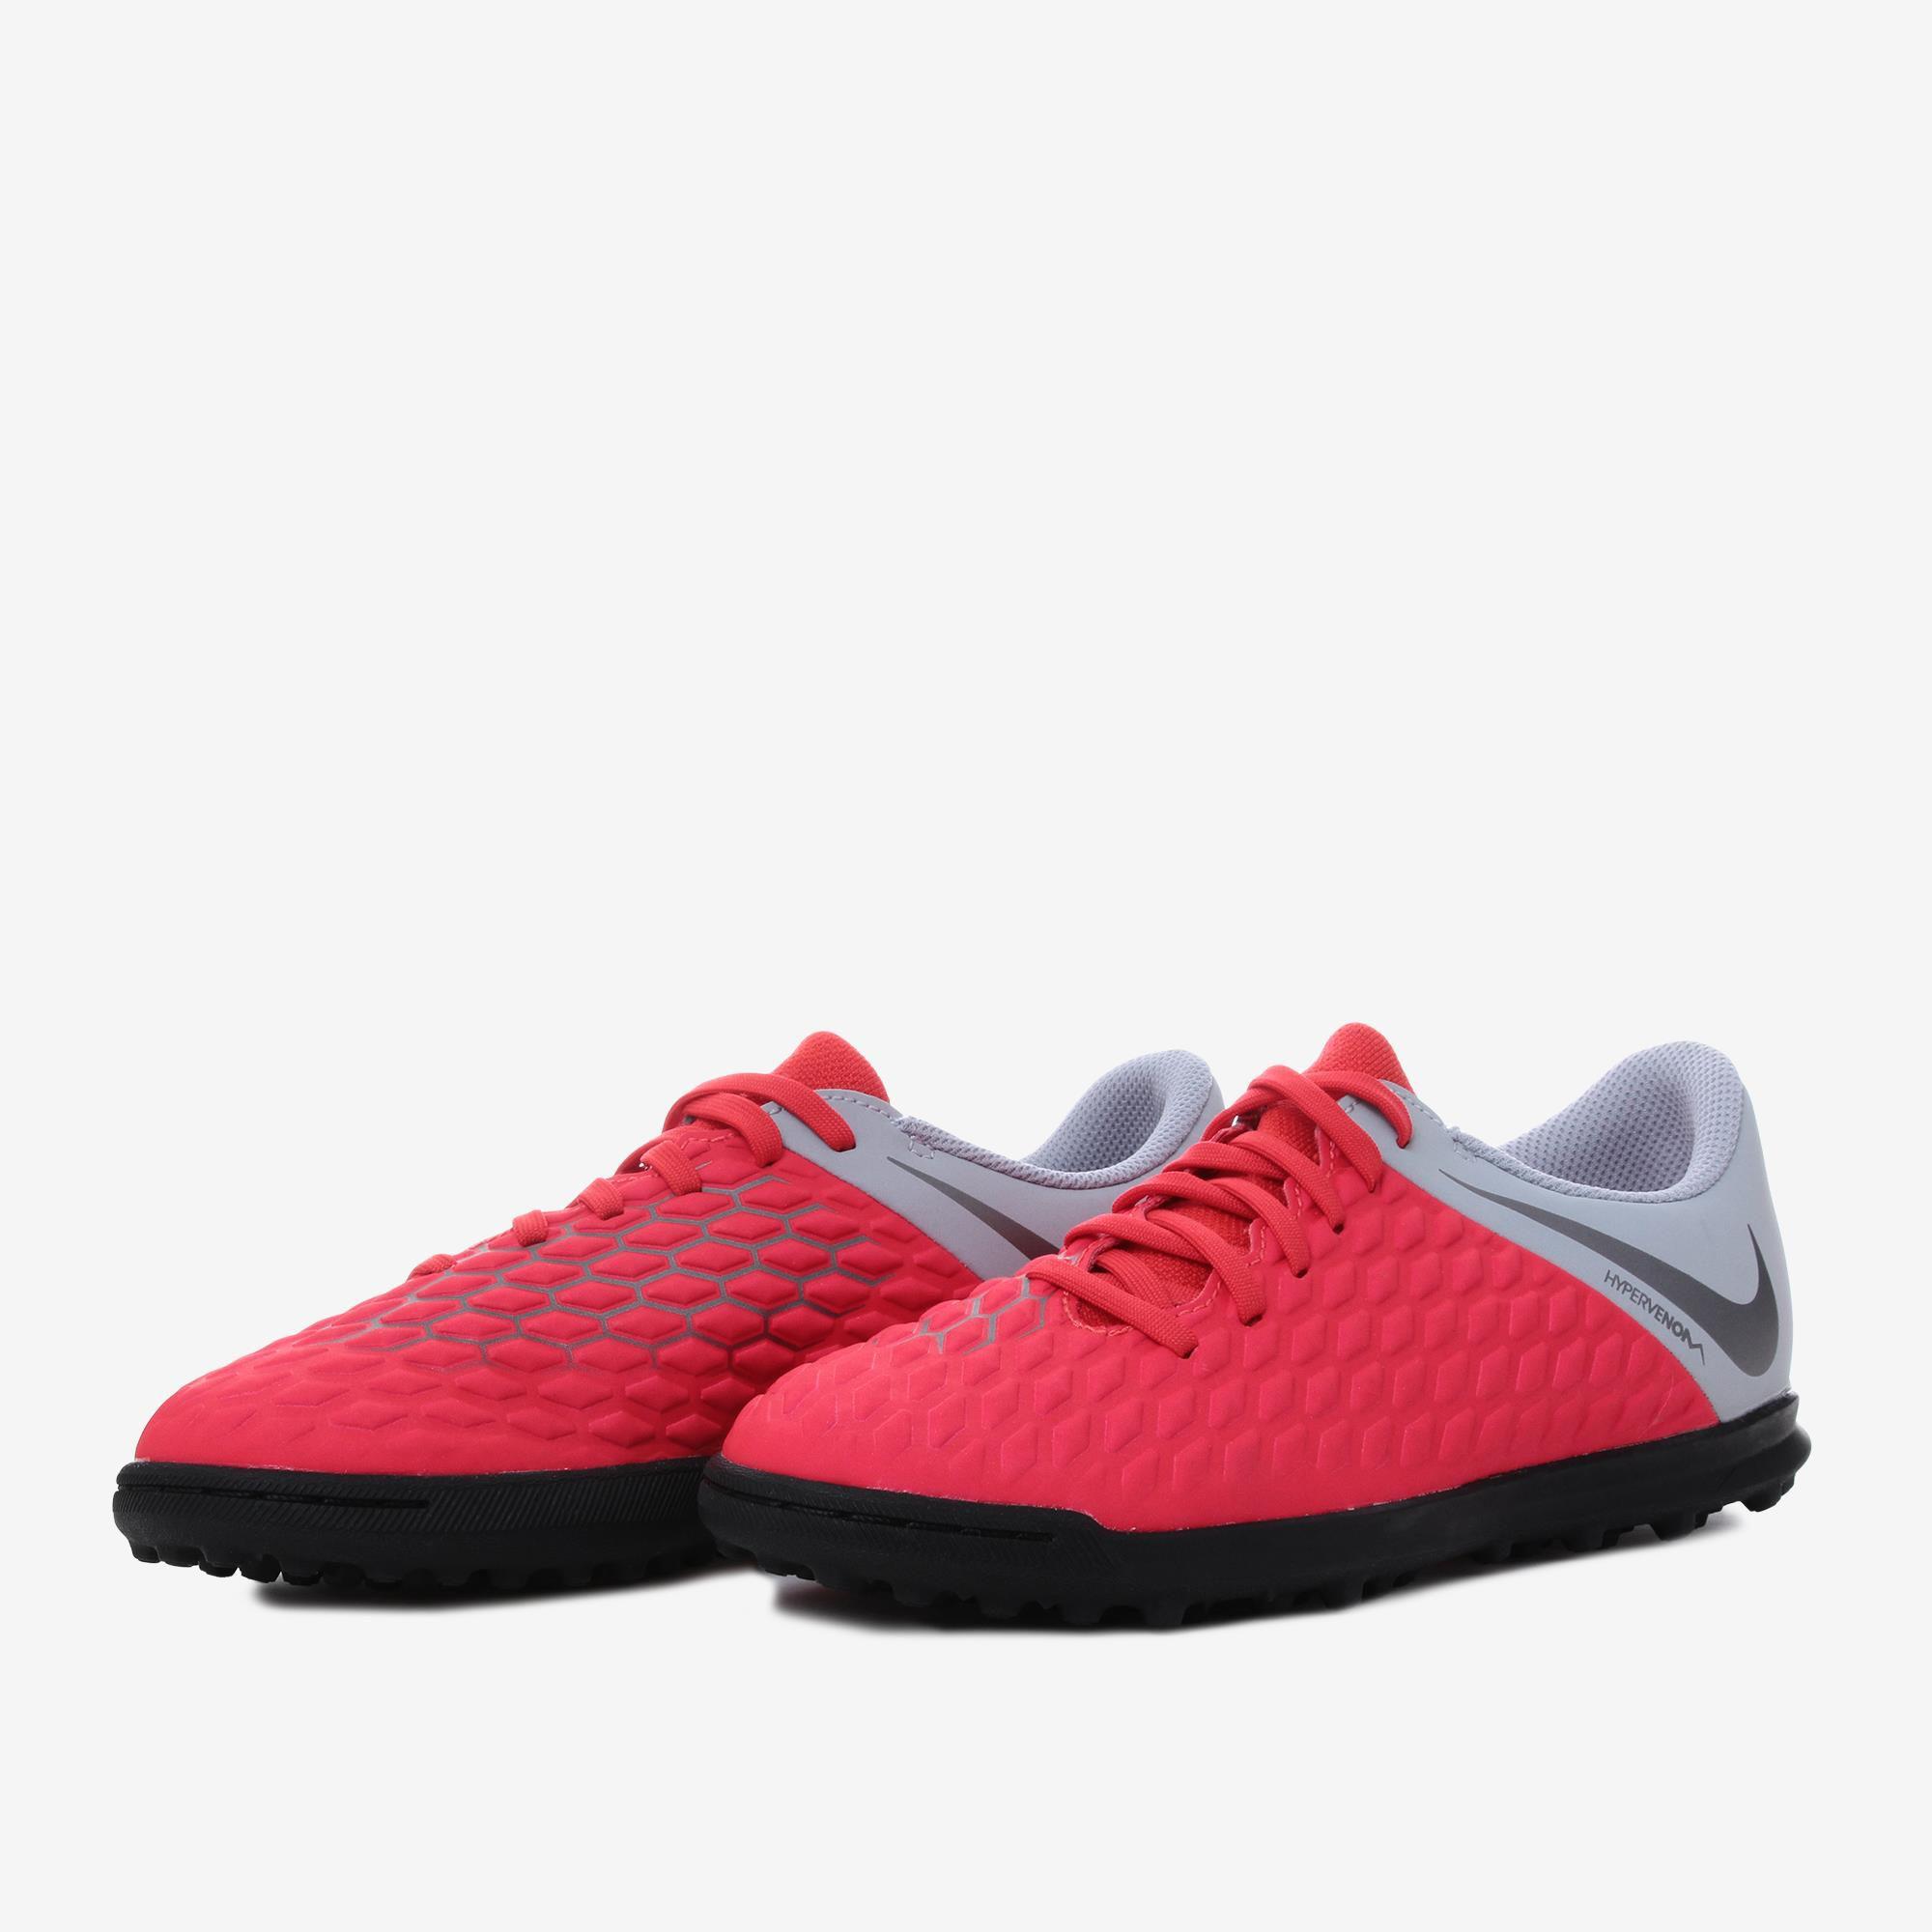 14b7e7e9a74 Chuteira Society Infantil Nike Hypervenom X III Club - Titanes Esportes